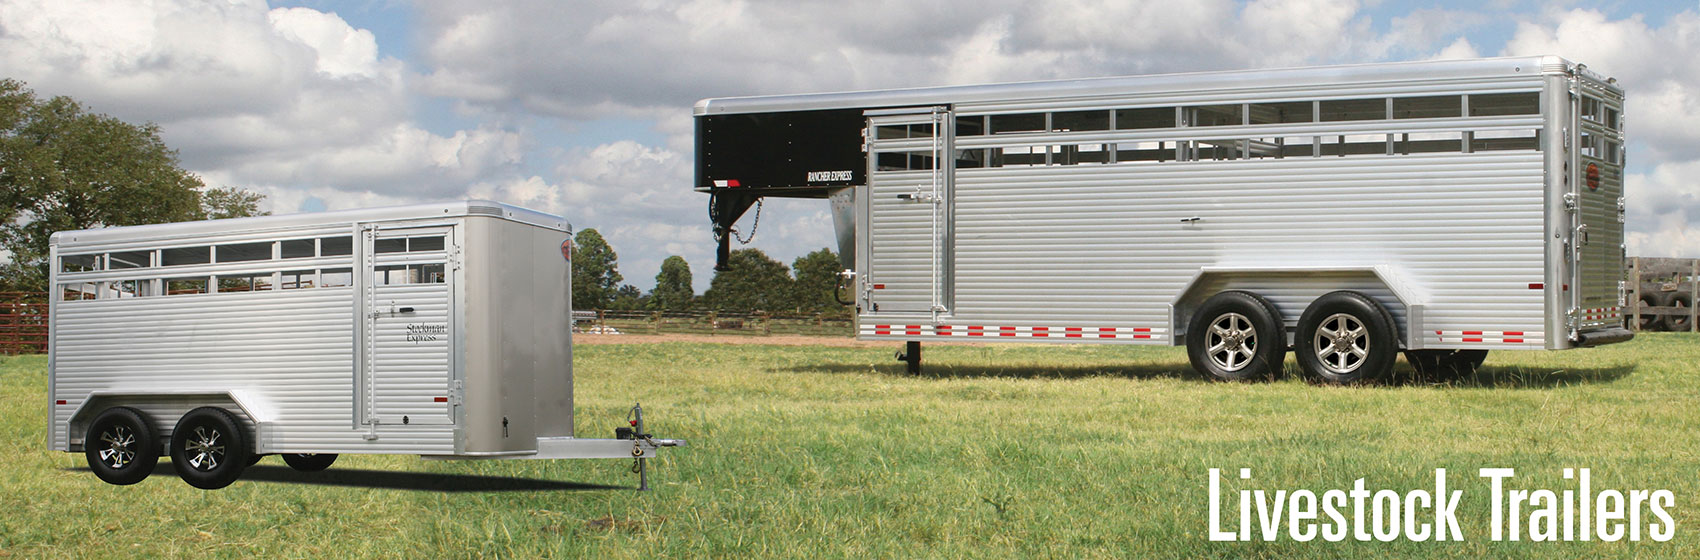 hight resolution of livestock trailer wiring harnes